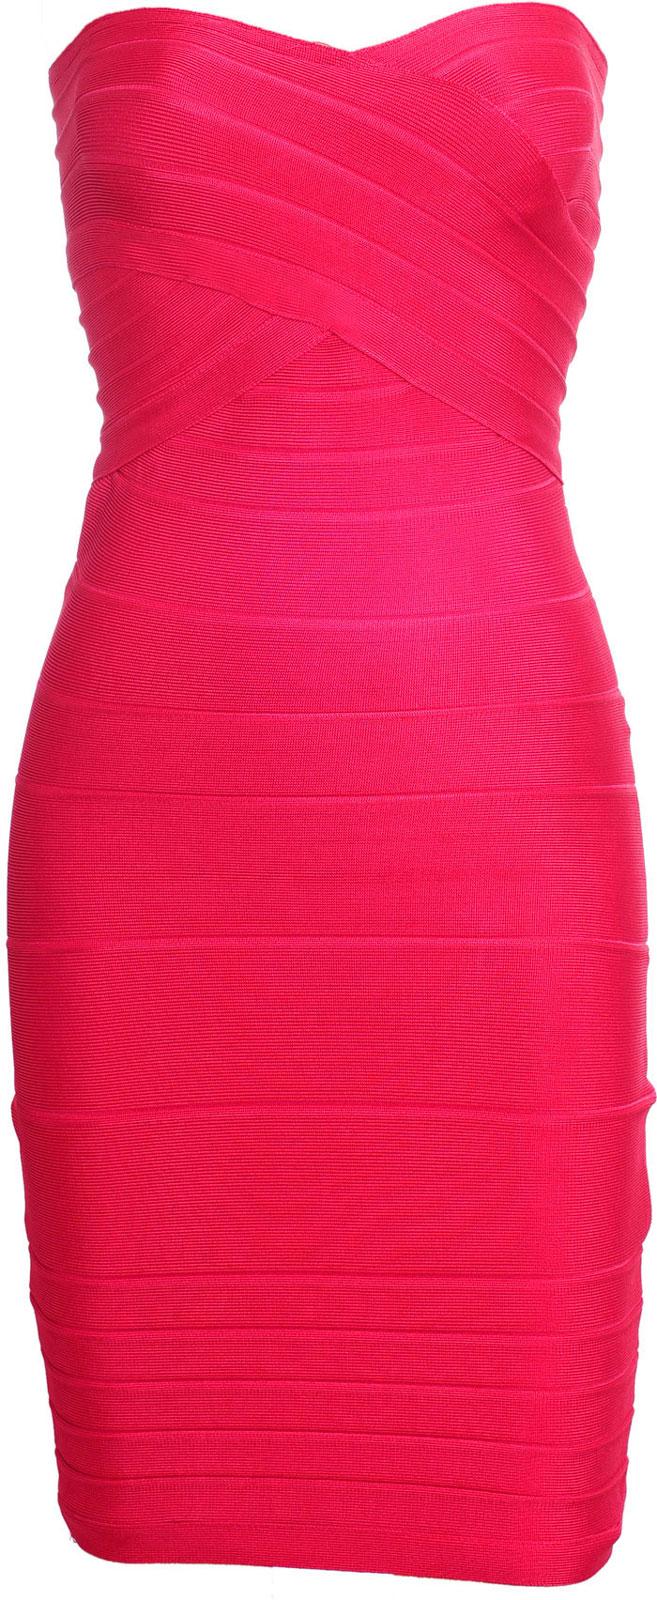 DSC 2886 cls Tamra Barneys Pink Season 8 Reunion Dress